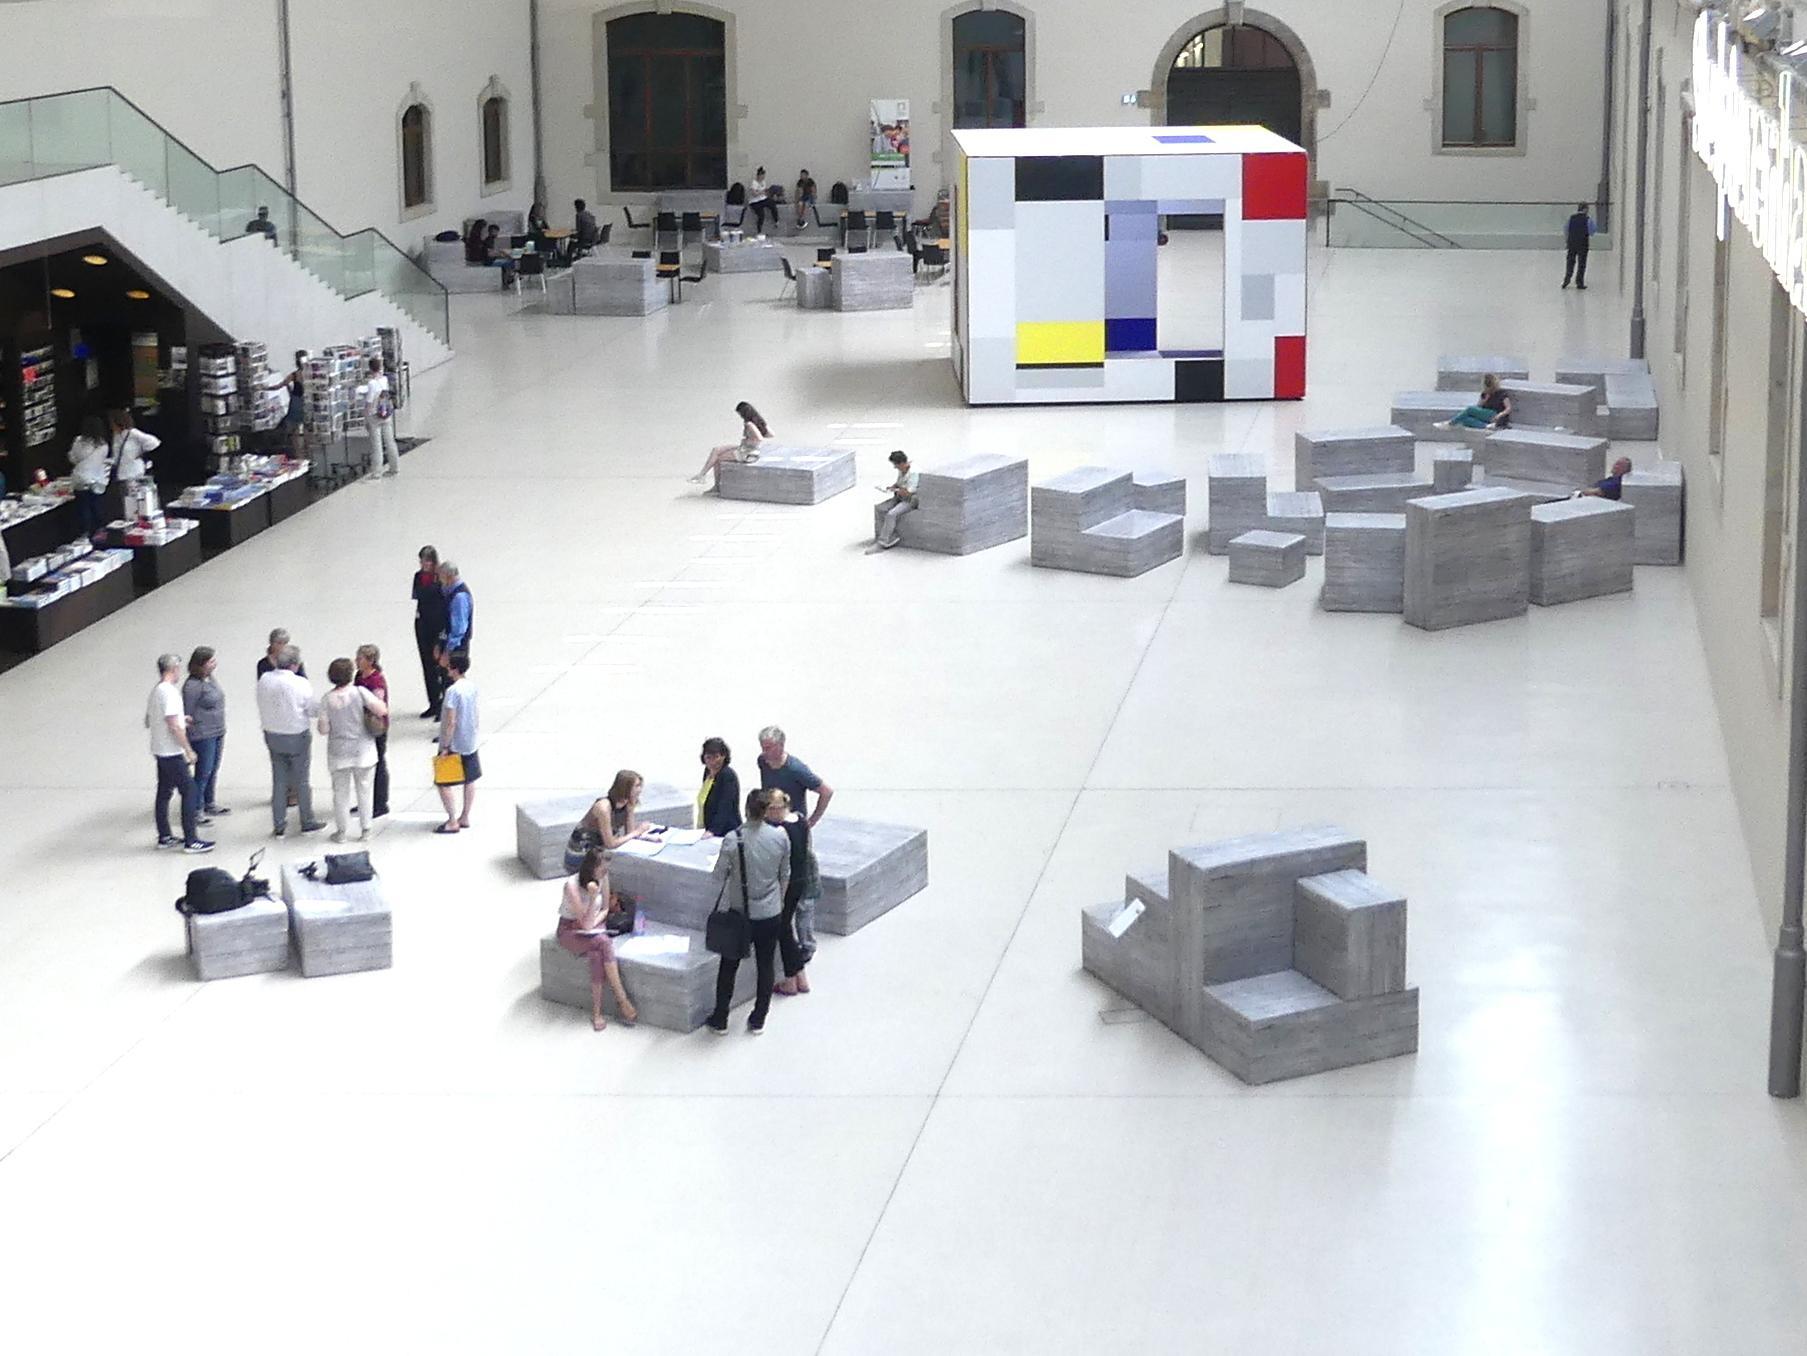 Dresden, Albertinum, Galerie Neue Meister, Erdgeschoss, Lichthof, Bild 4/5